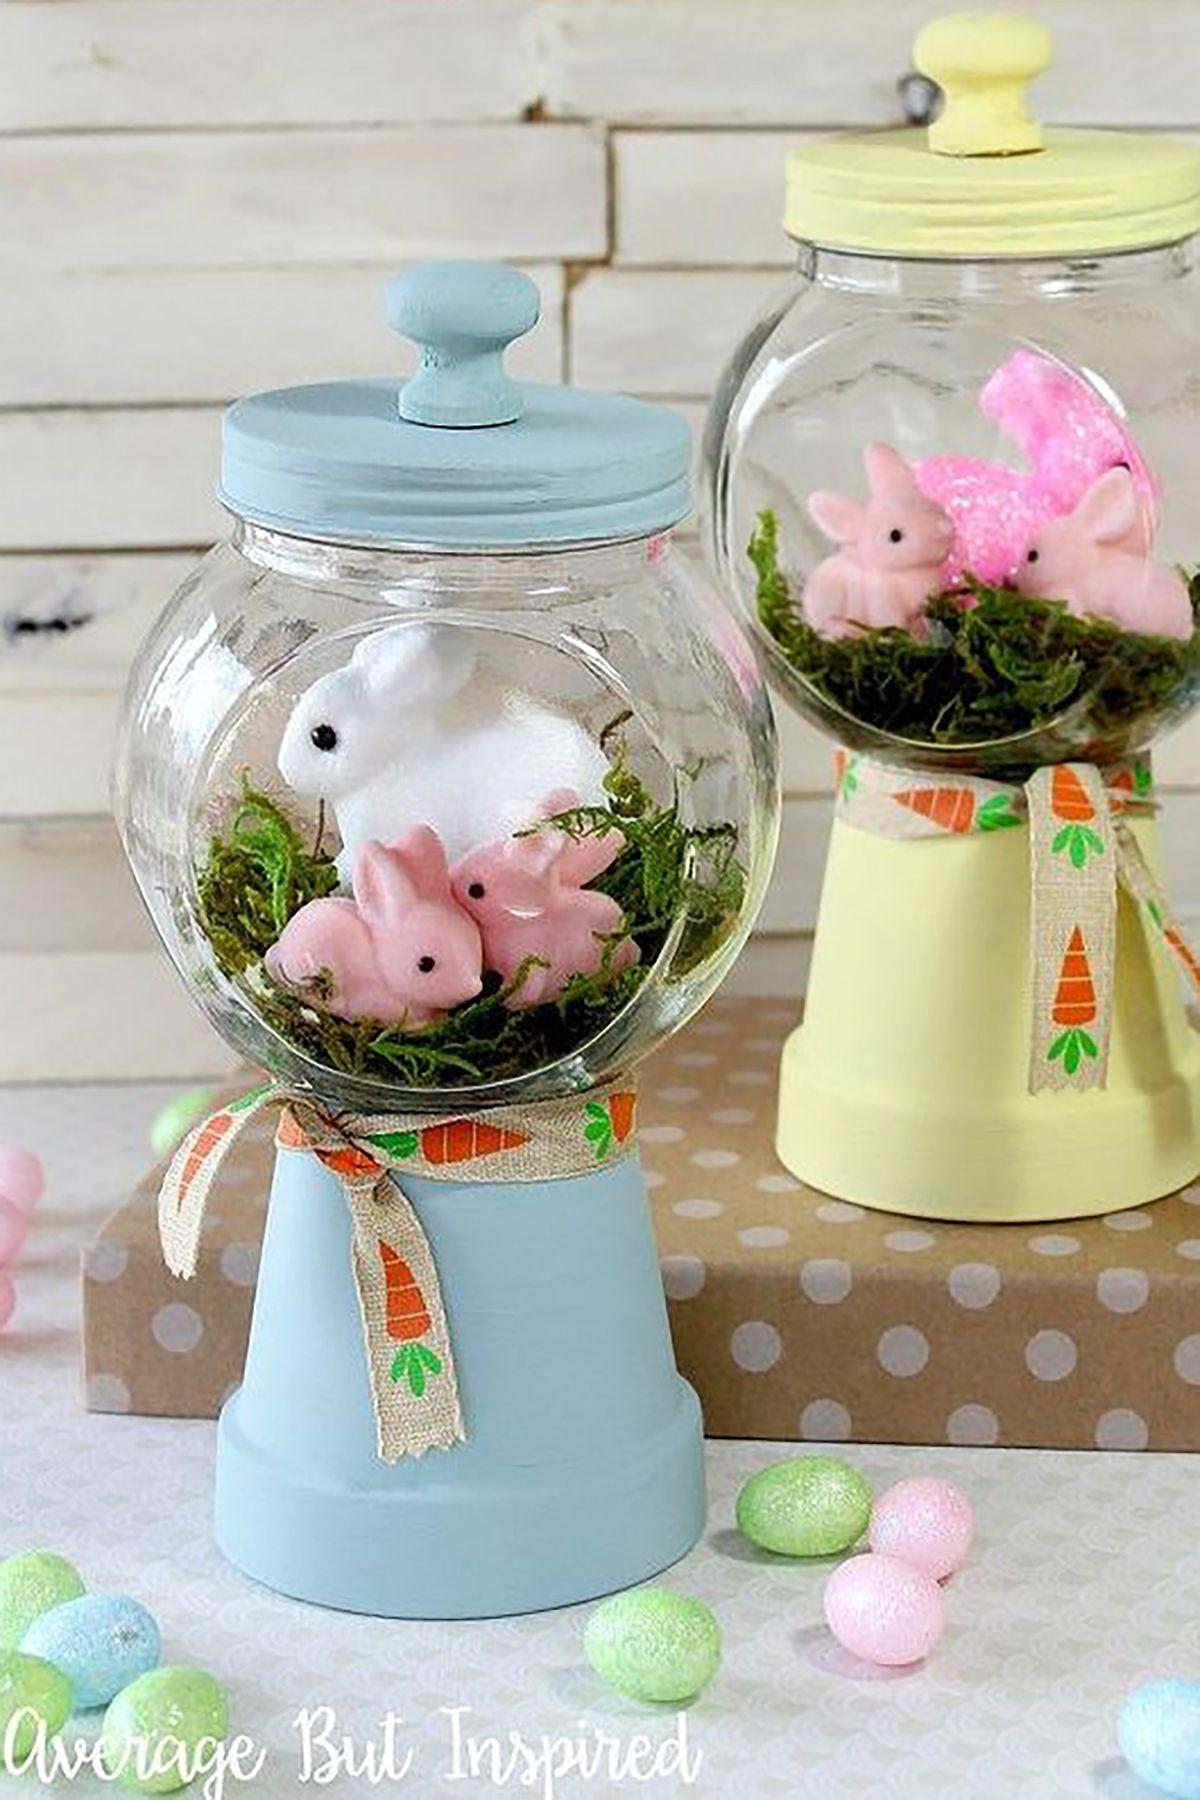 spring bunnies diy gumball machine craft crafts easter decorations seasonal holiday decor 1